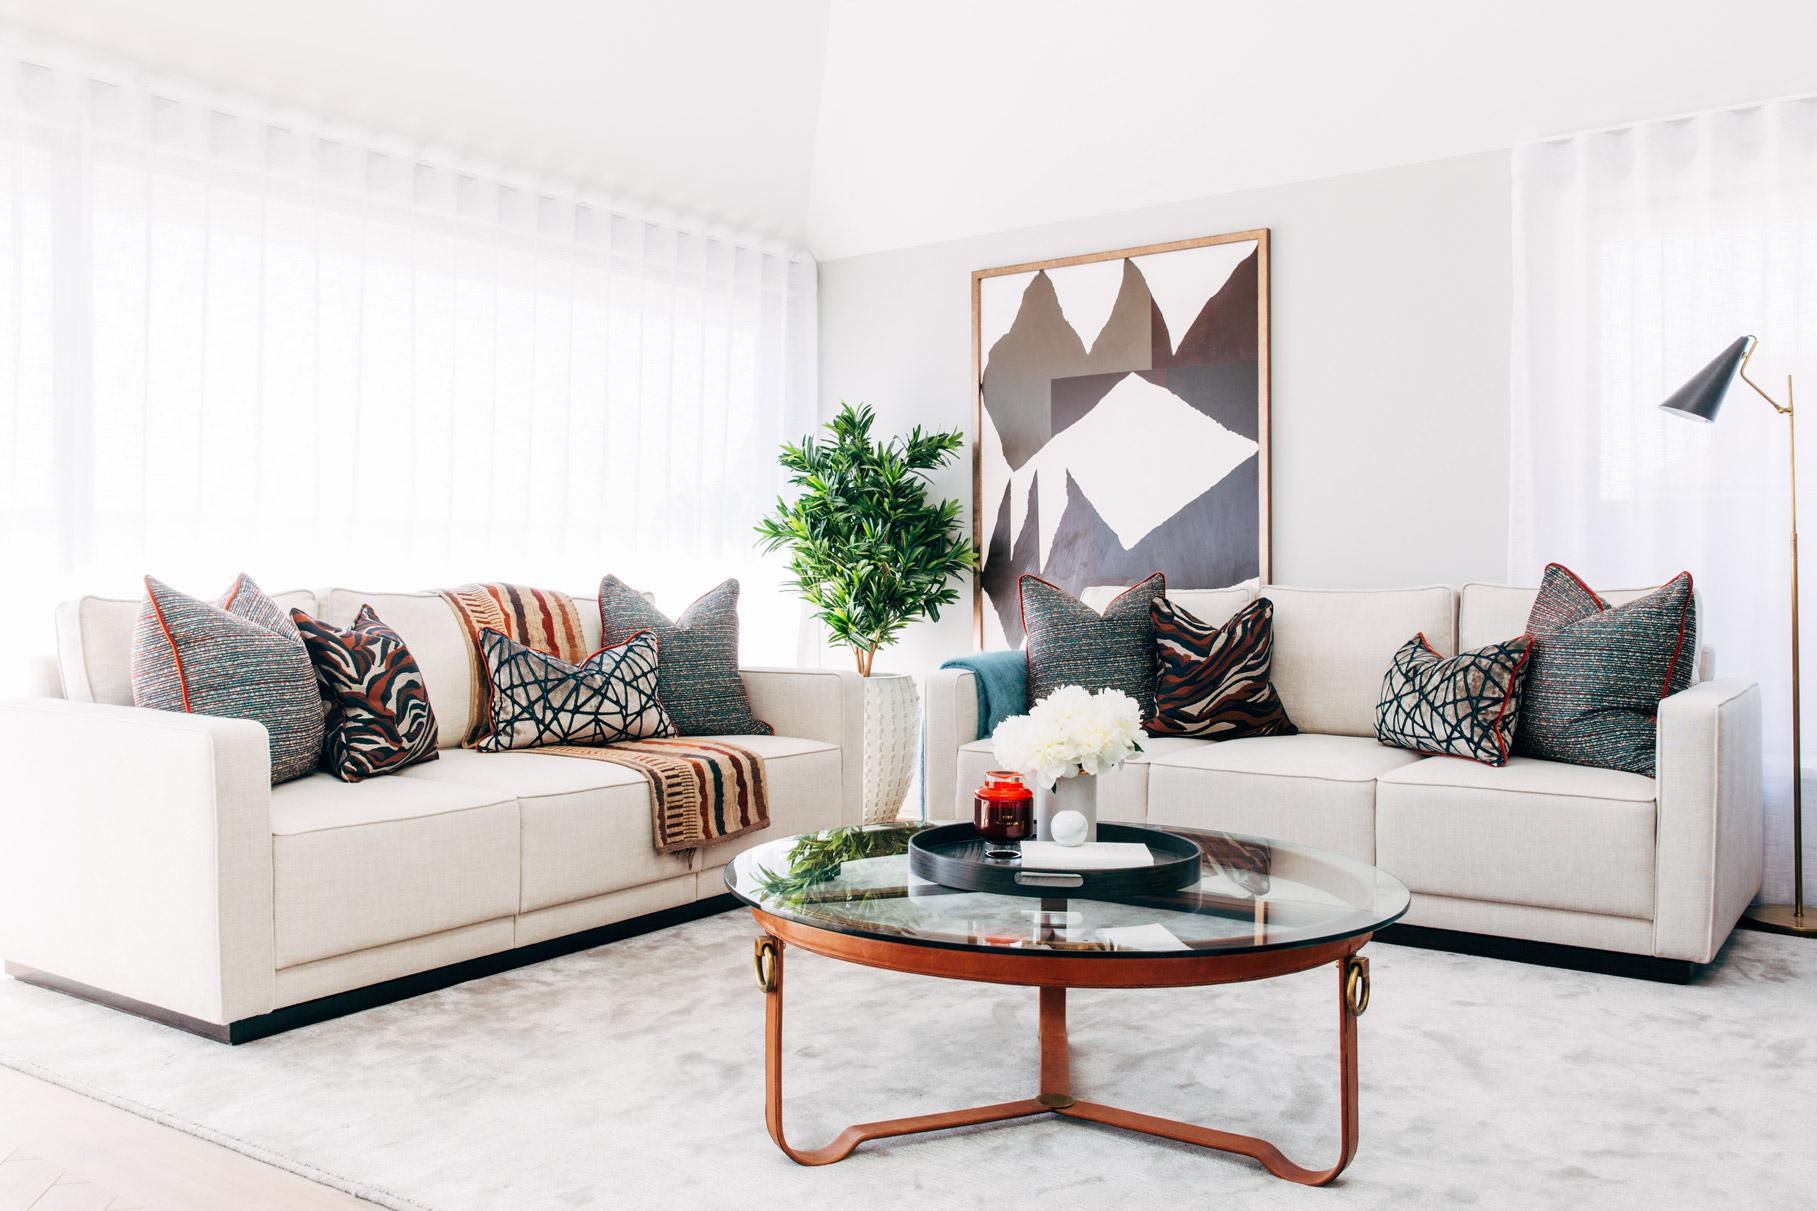 A_LONDON_Hamilton_Court_1_01_Living_Room.jpg